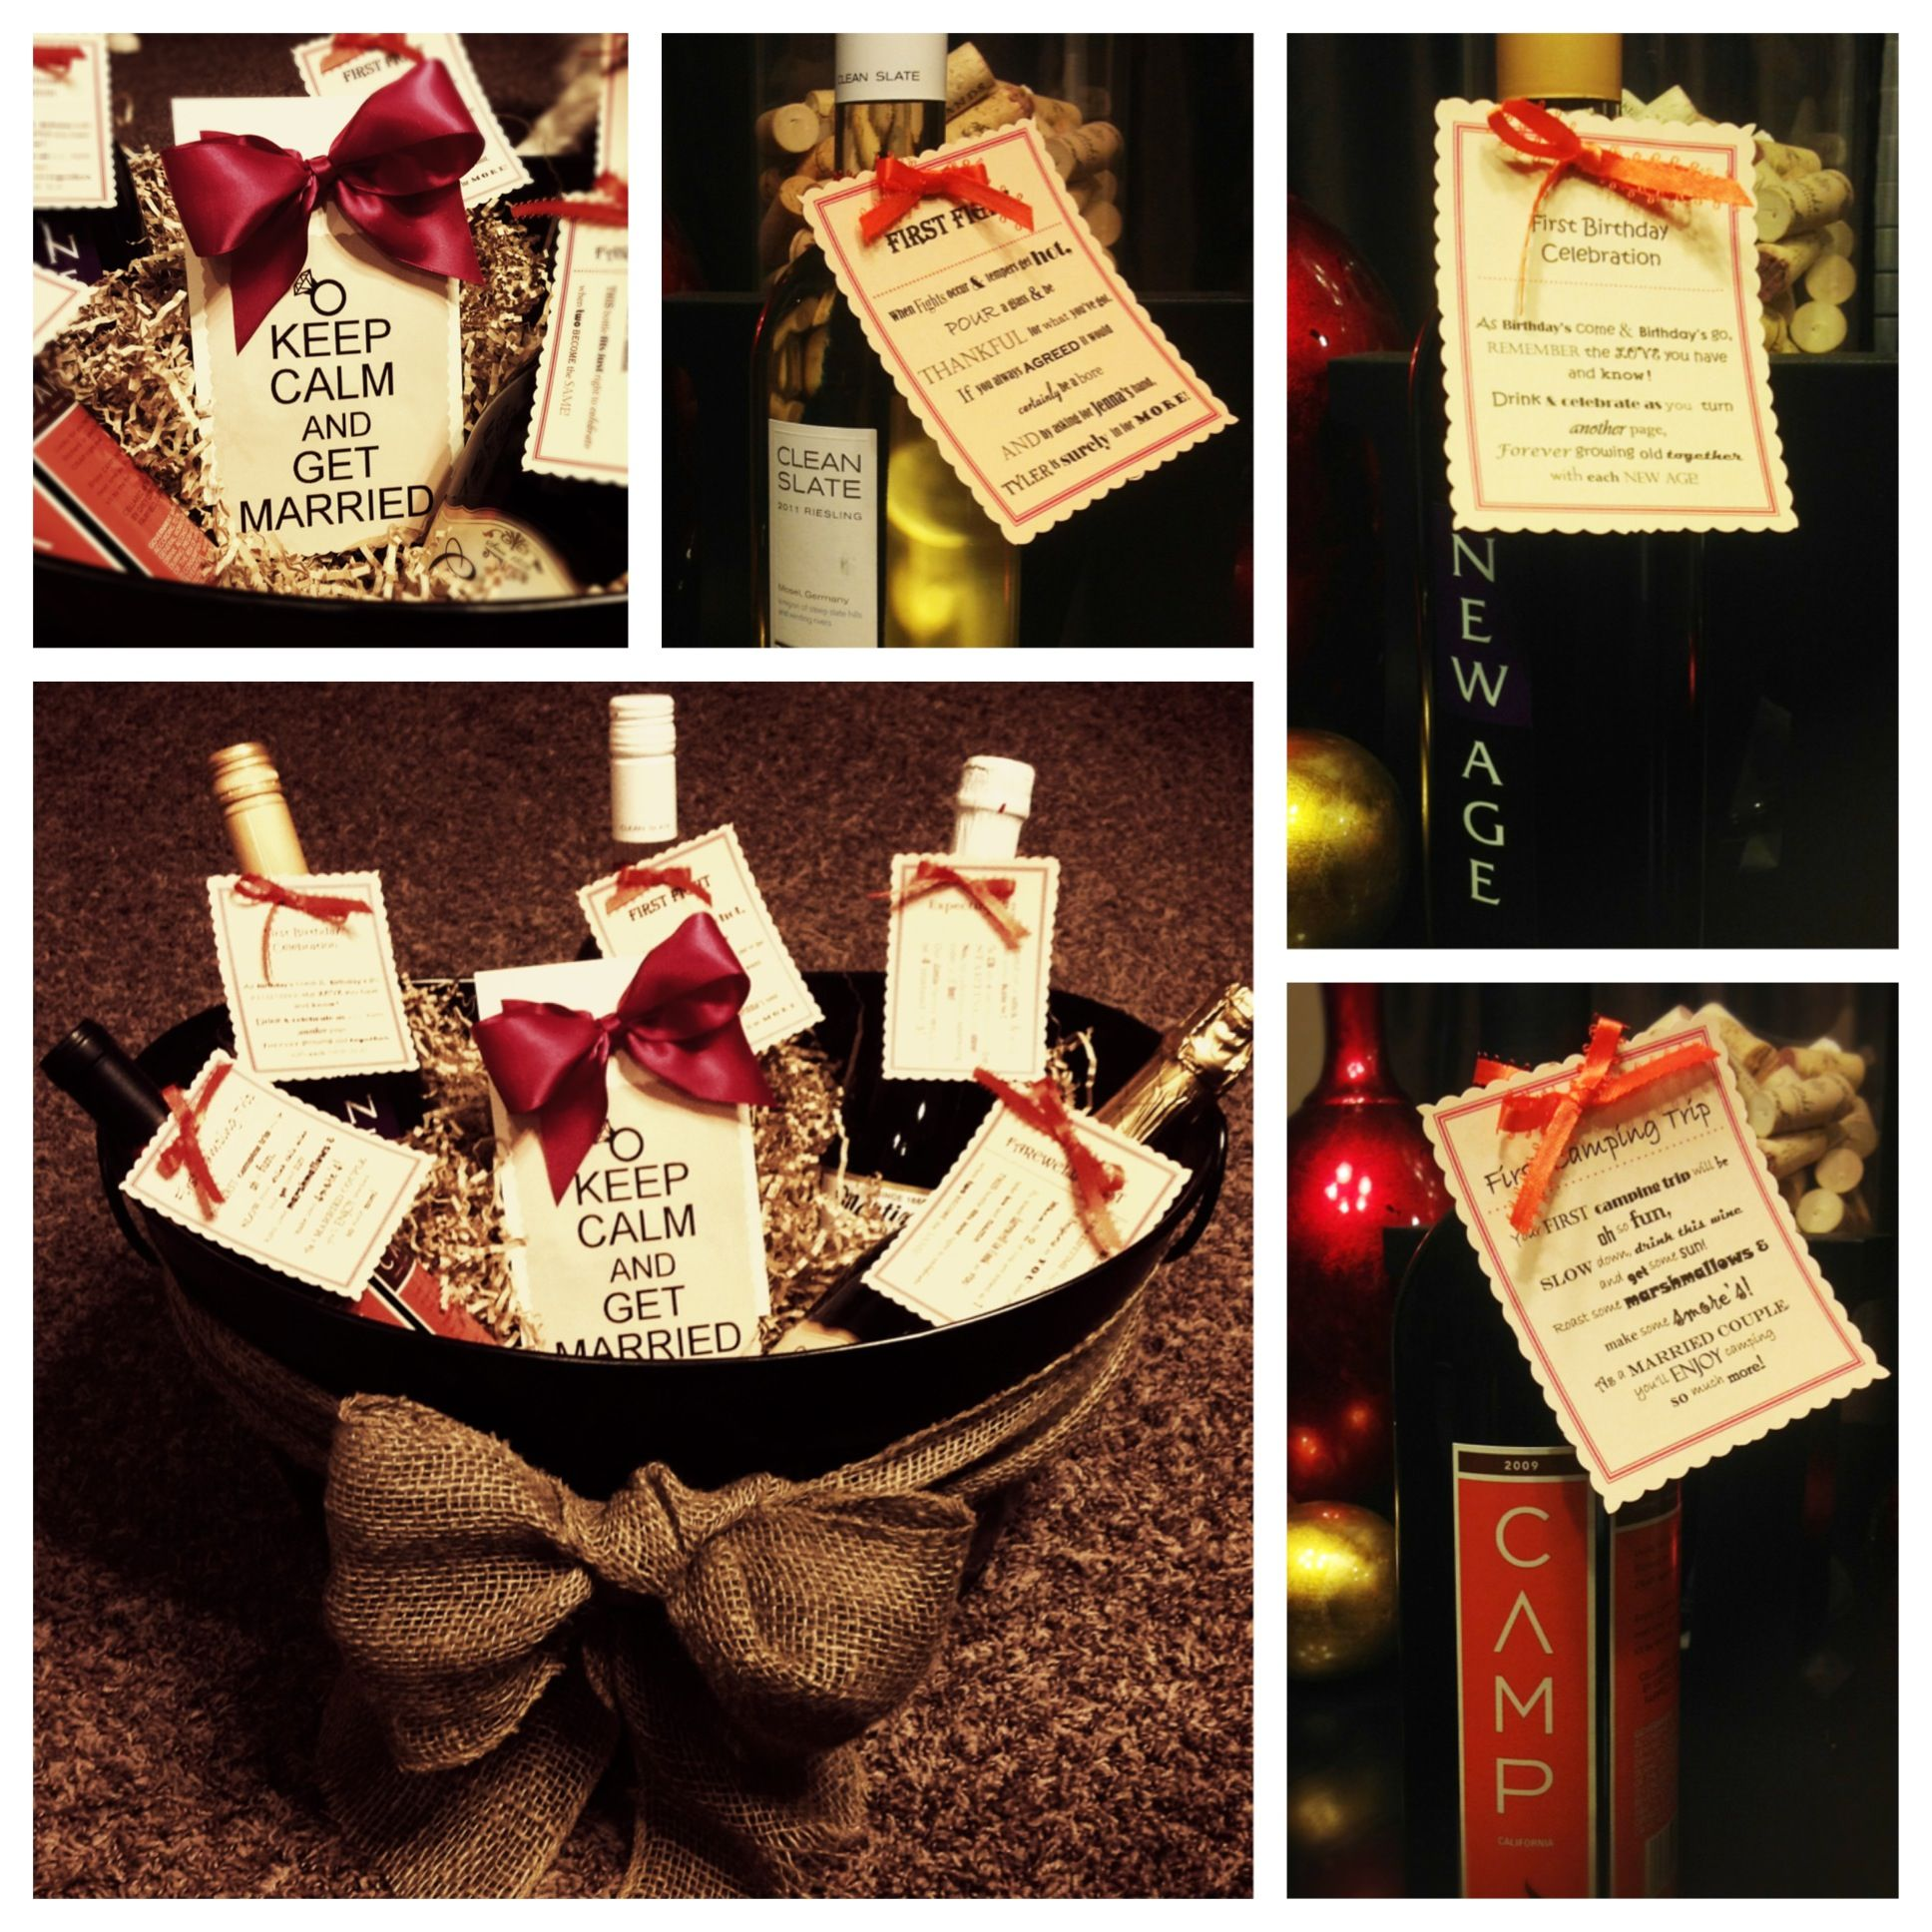 Best Wine For Wedding Gift: Wine Basket Gift For A Bridal Shower